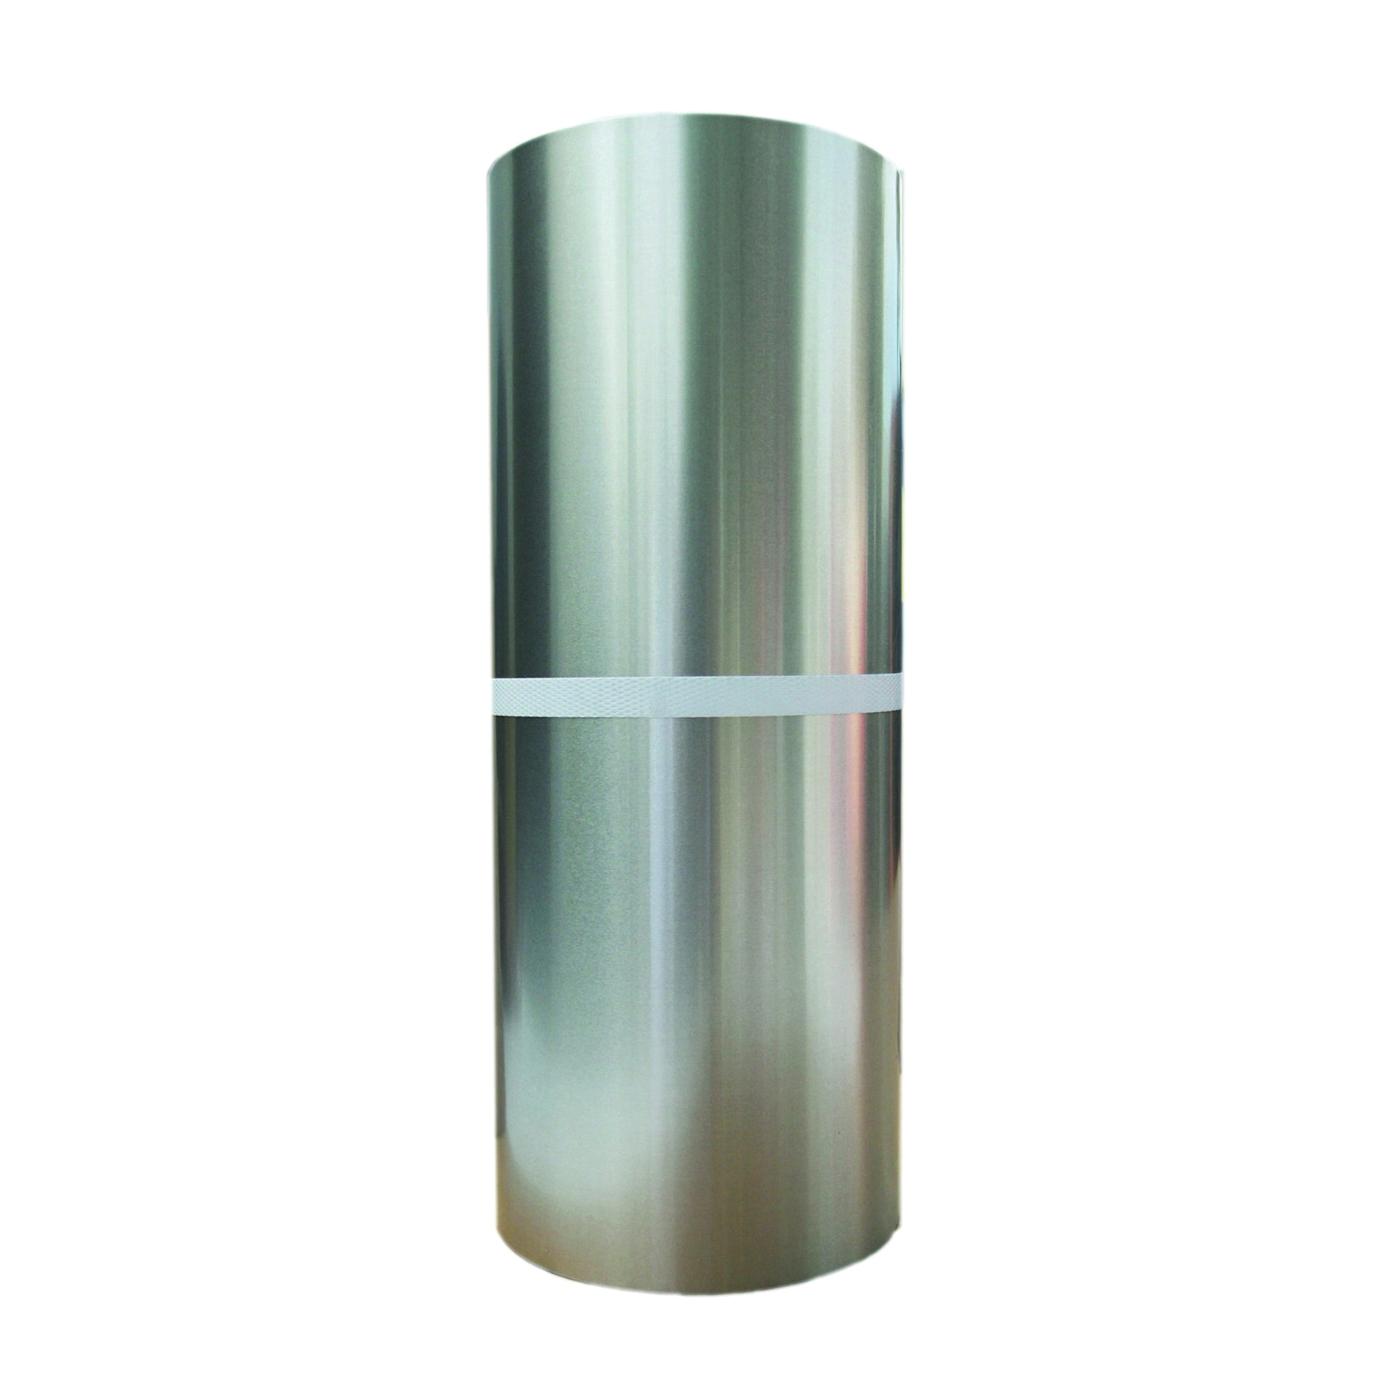 Picture of BILLY PENN 6840 Handy Roll, 25 ft L, 14 in W, 0.0086 Gauge, Aluminum